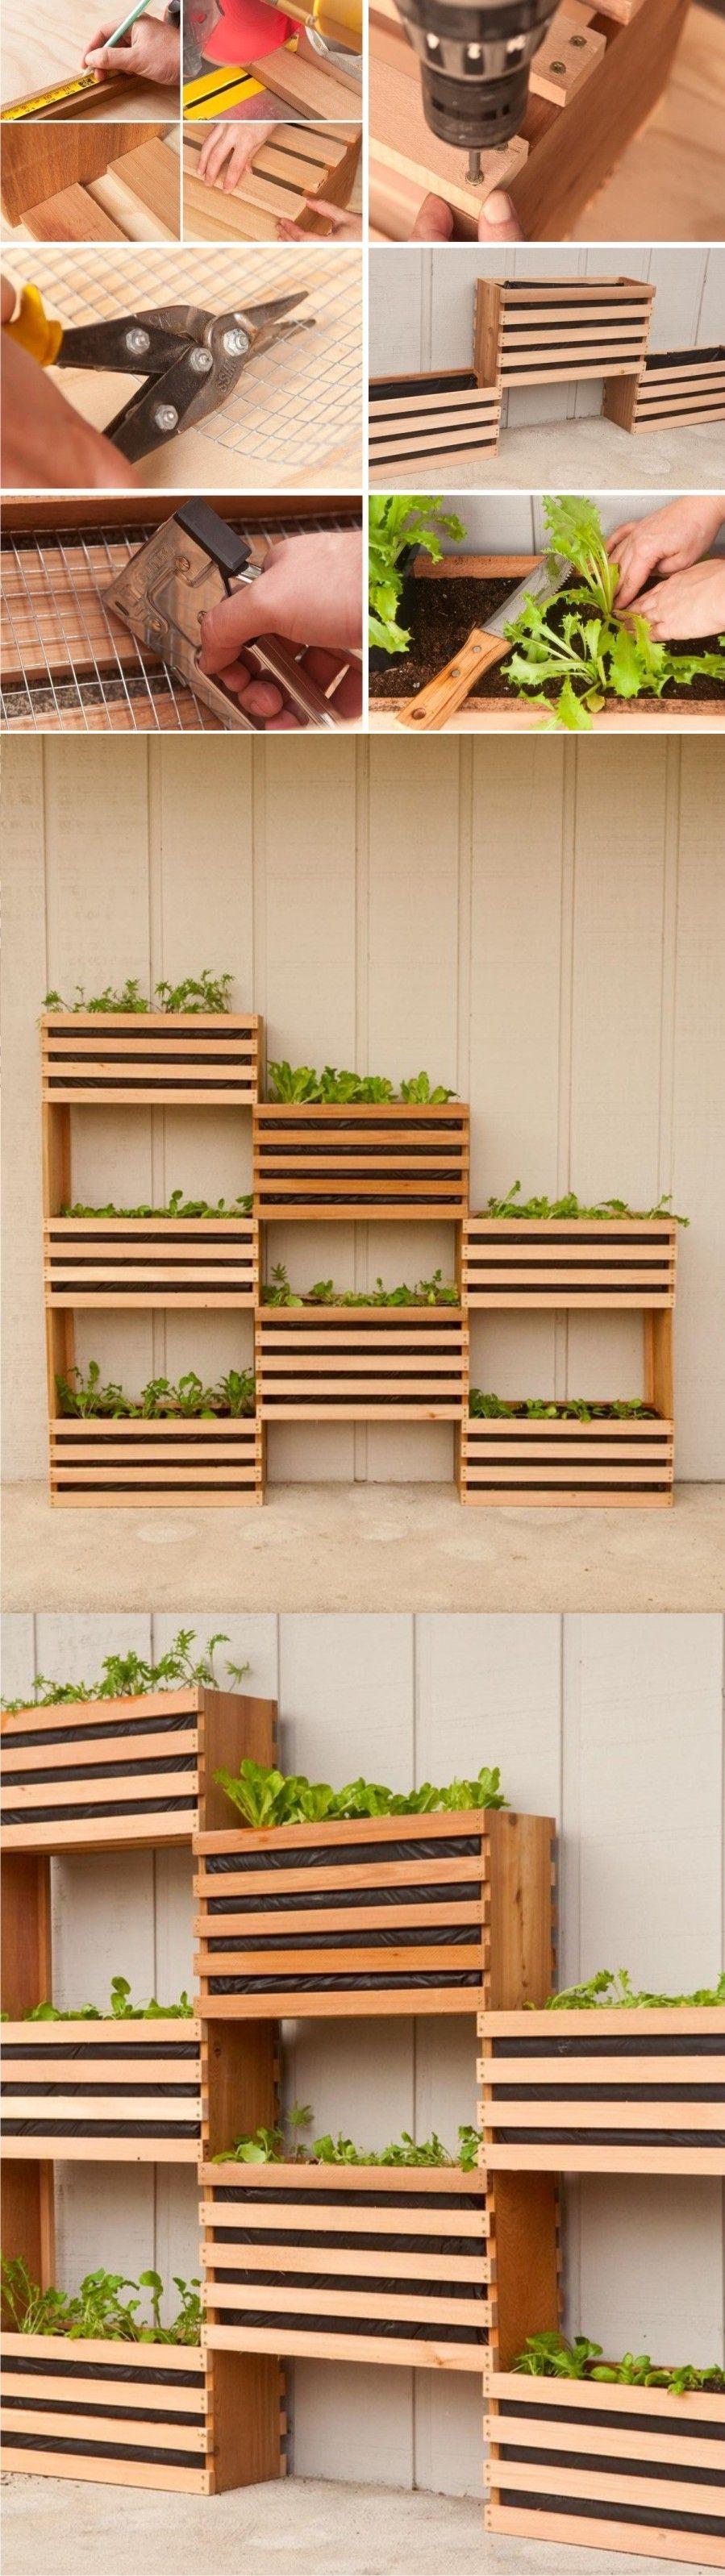 Superb How To: Make A Modern, Space Saving Vertical Vegetable Garden